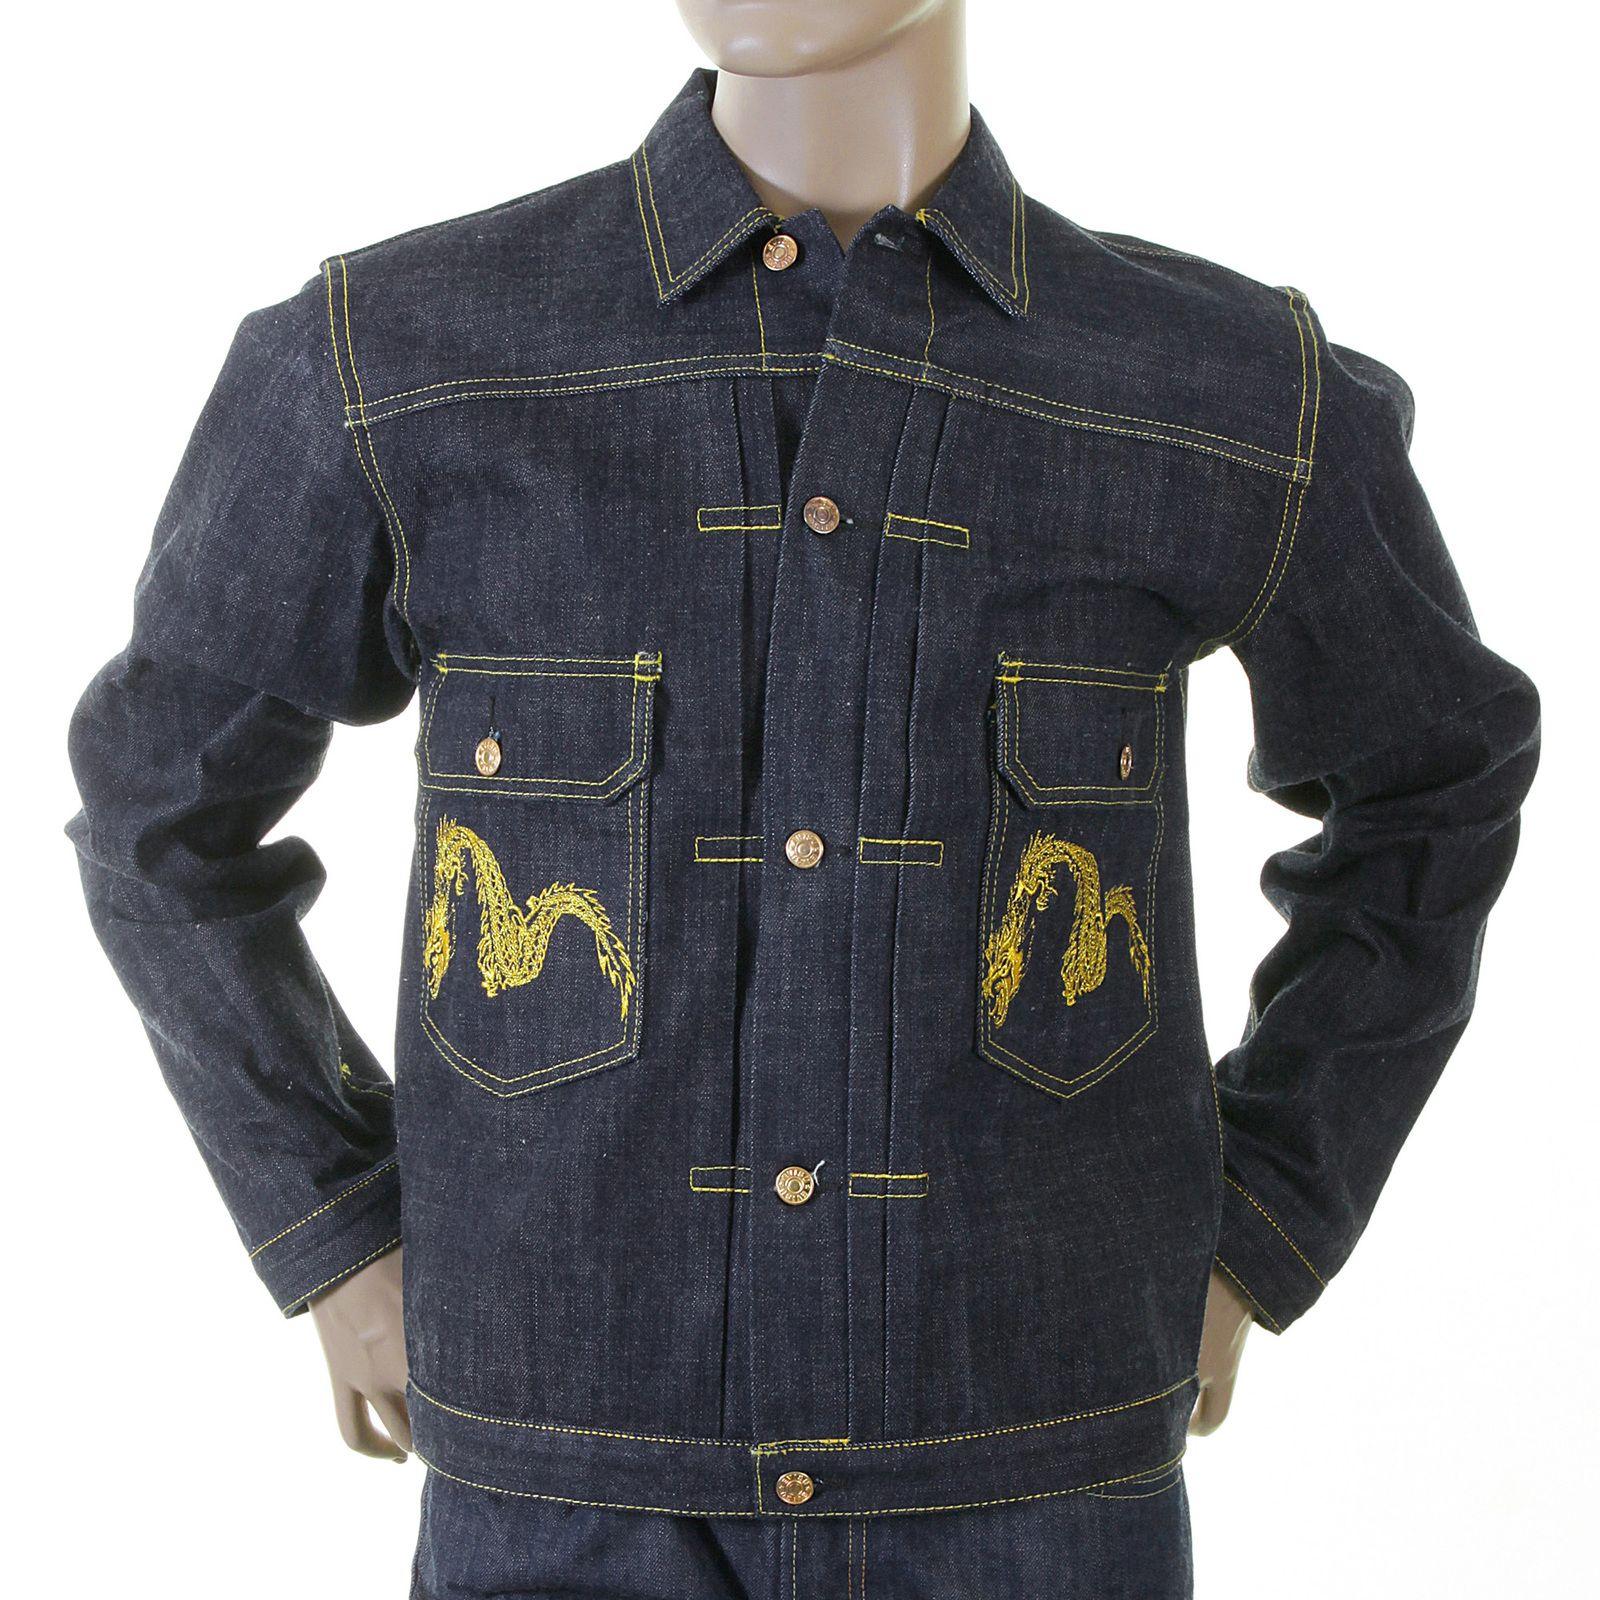 Shop For The Non Wash Mens Indigo Denim Jacket By Evisu Indigo Denim Jacket Jackets Denim [ 1600 x 1600 Pixel ]